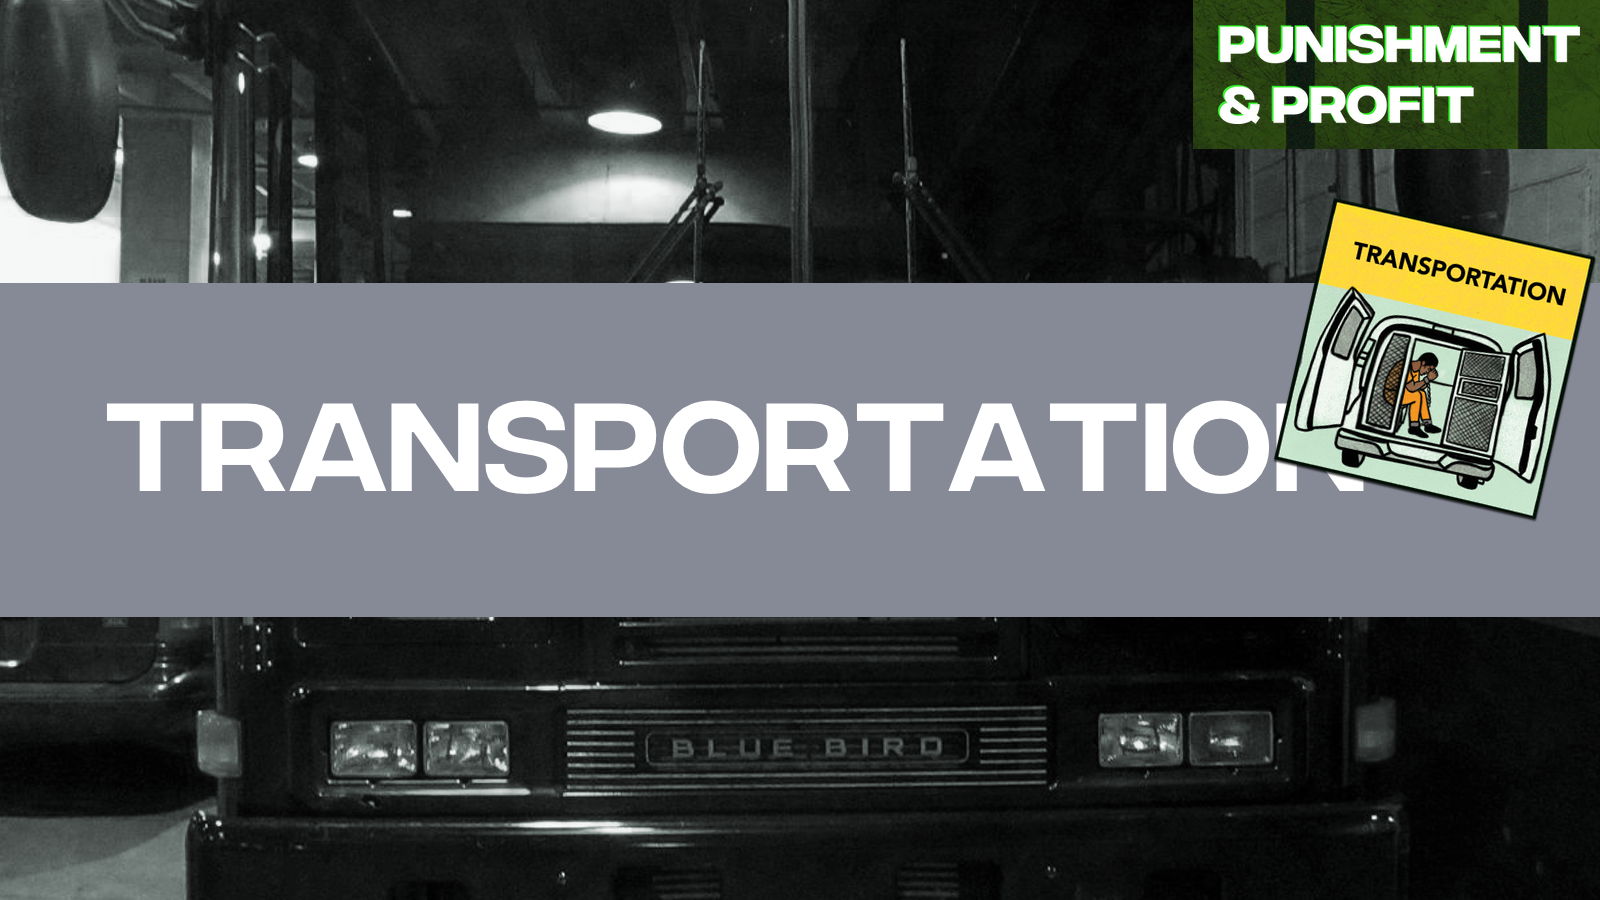 Punishment & Profit: Transportation